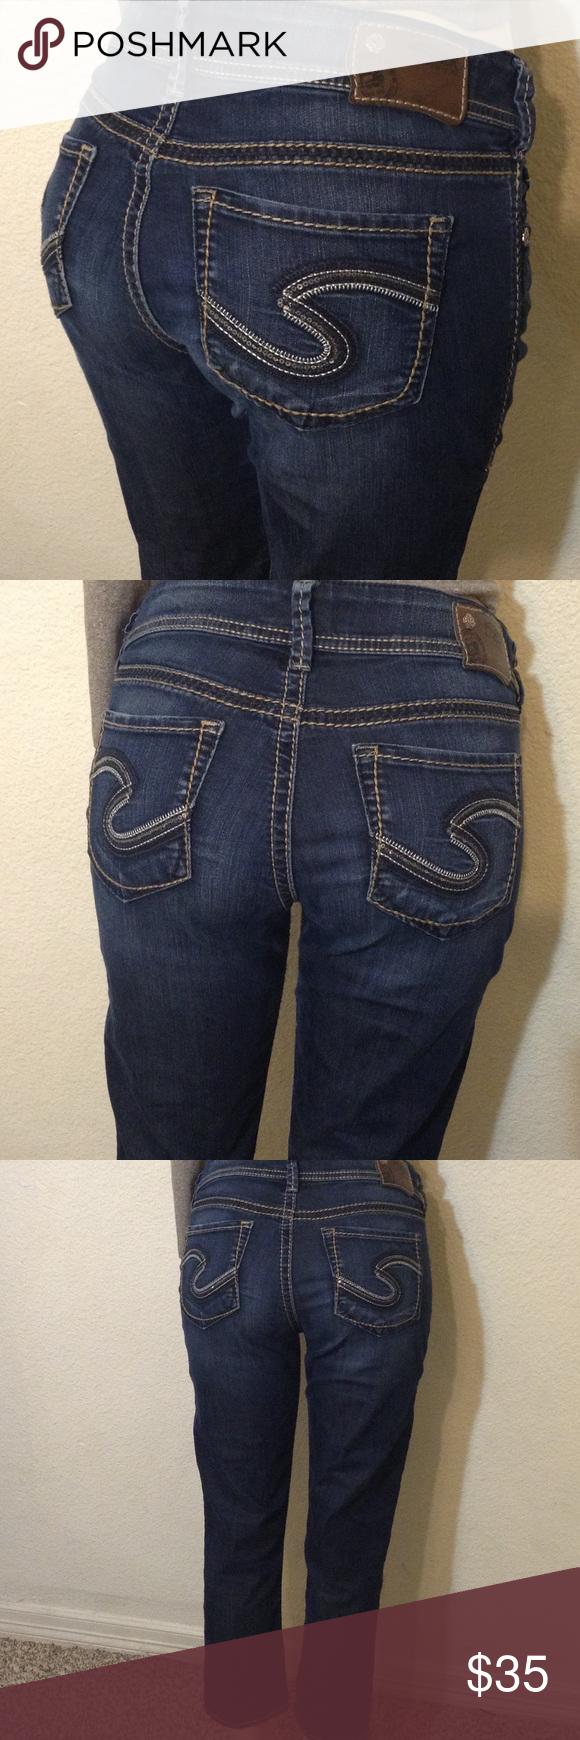 SILVER jeans CAPRI size 29